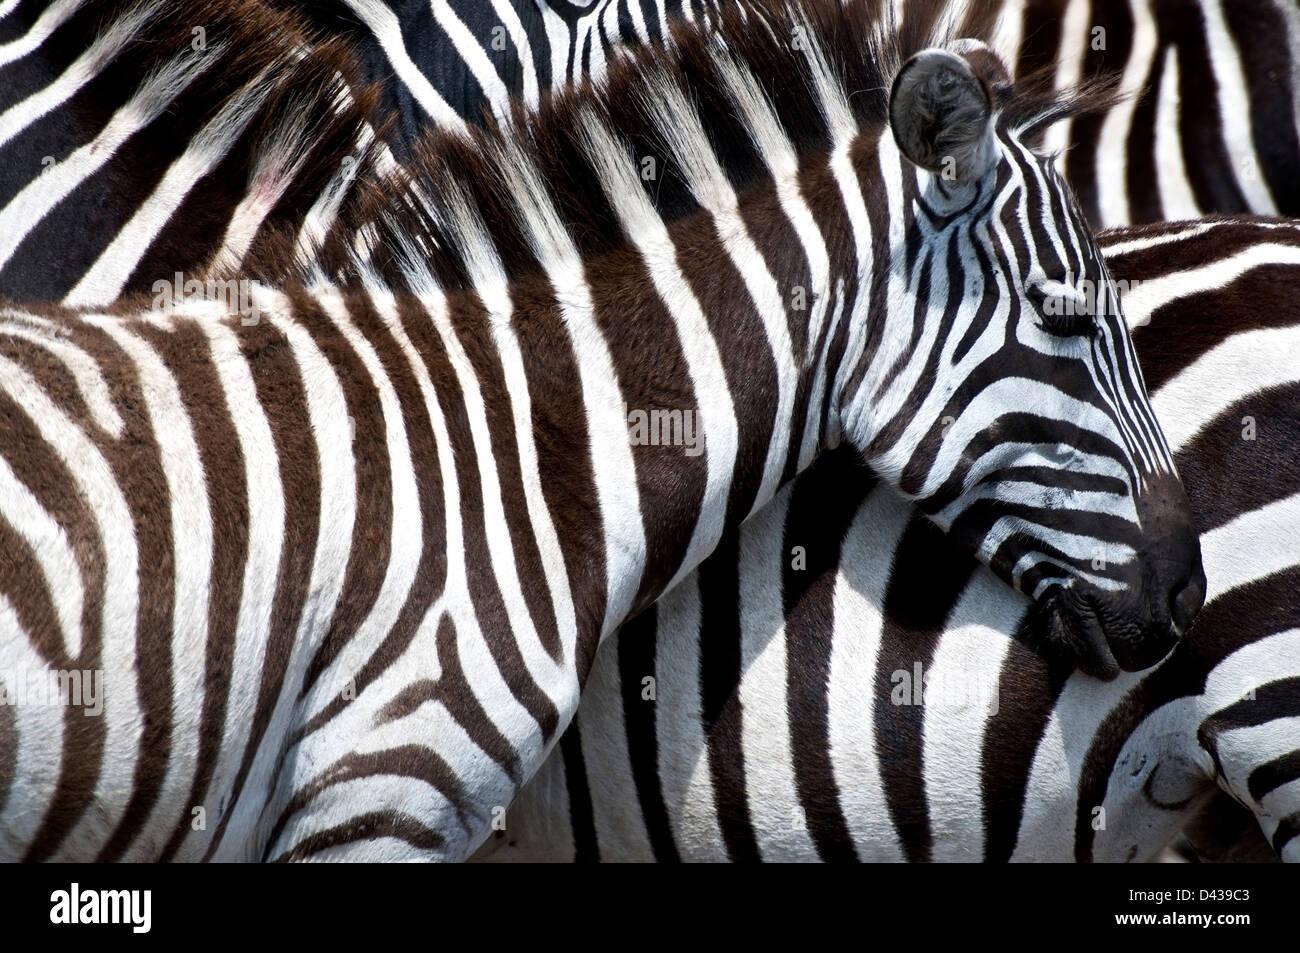 Plains Zebra, Equus quagga, grouping together in the Masai Mara reserve, Kenya Stock Photo